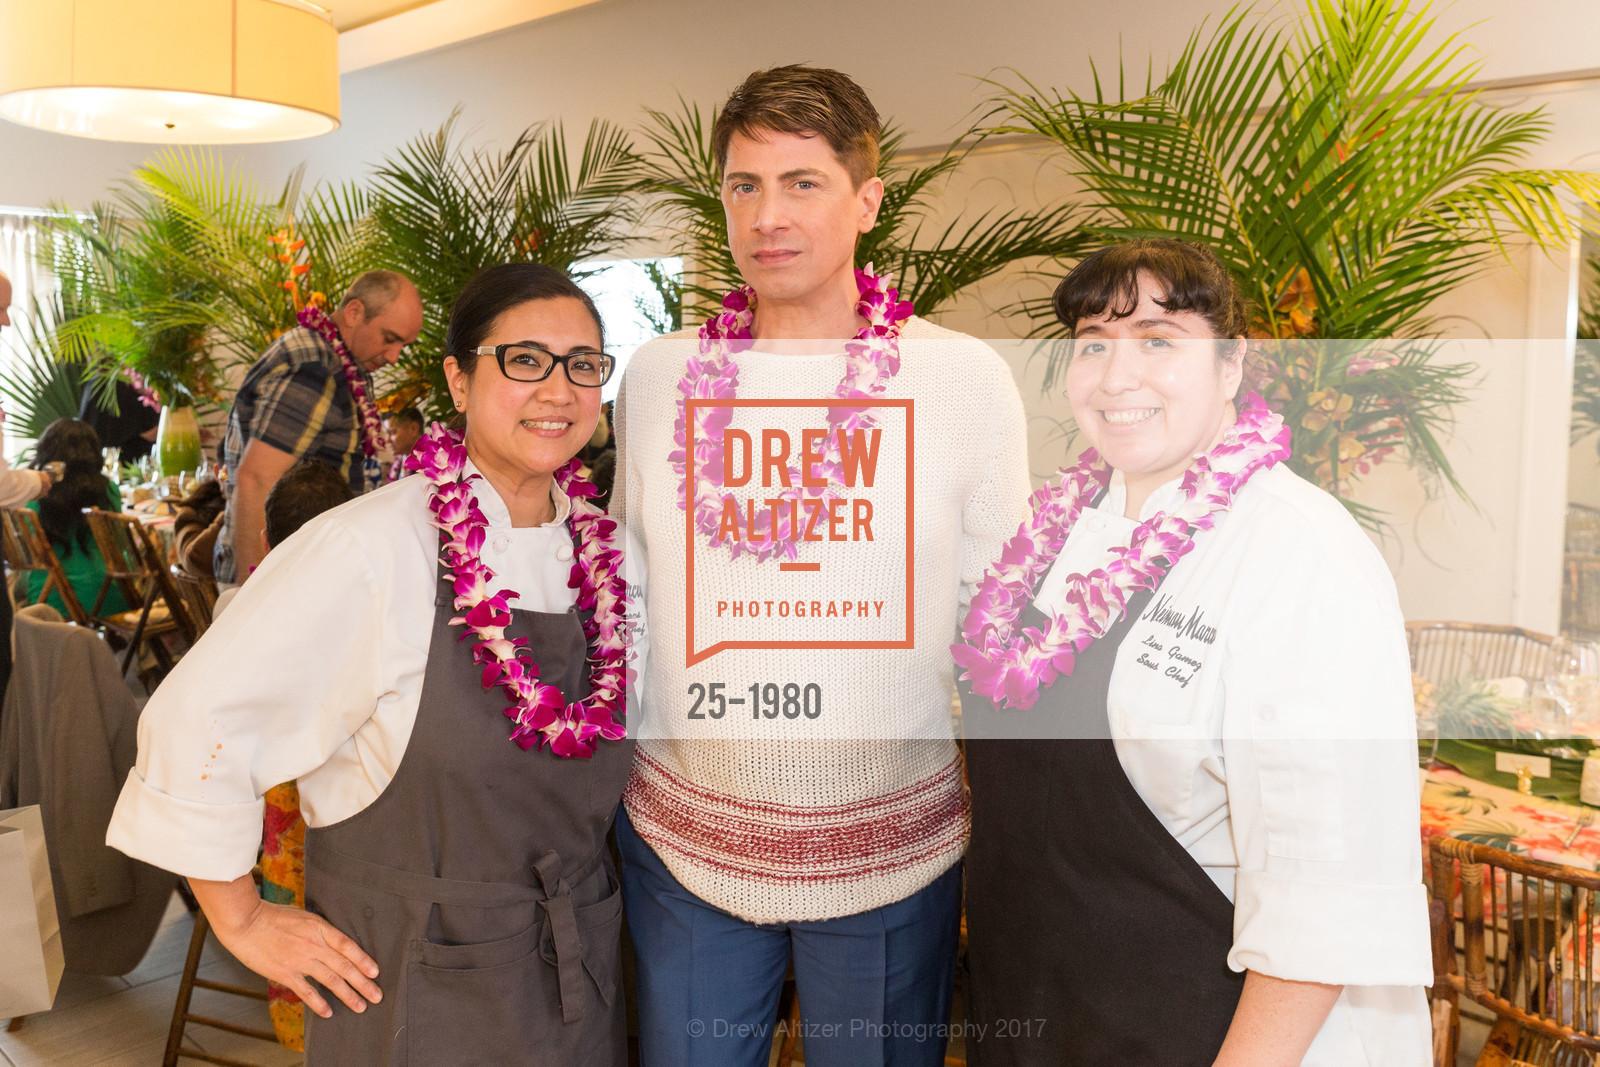 Ruby Oliveros, Aubrey Brewster, Lina Gomez, Aubrey Brewster's Purely Paradise Birthday Luncheon 2017, Neiman Marcus. 150 Stockton St  SF, California 94108, March 24th, 2017